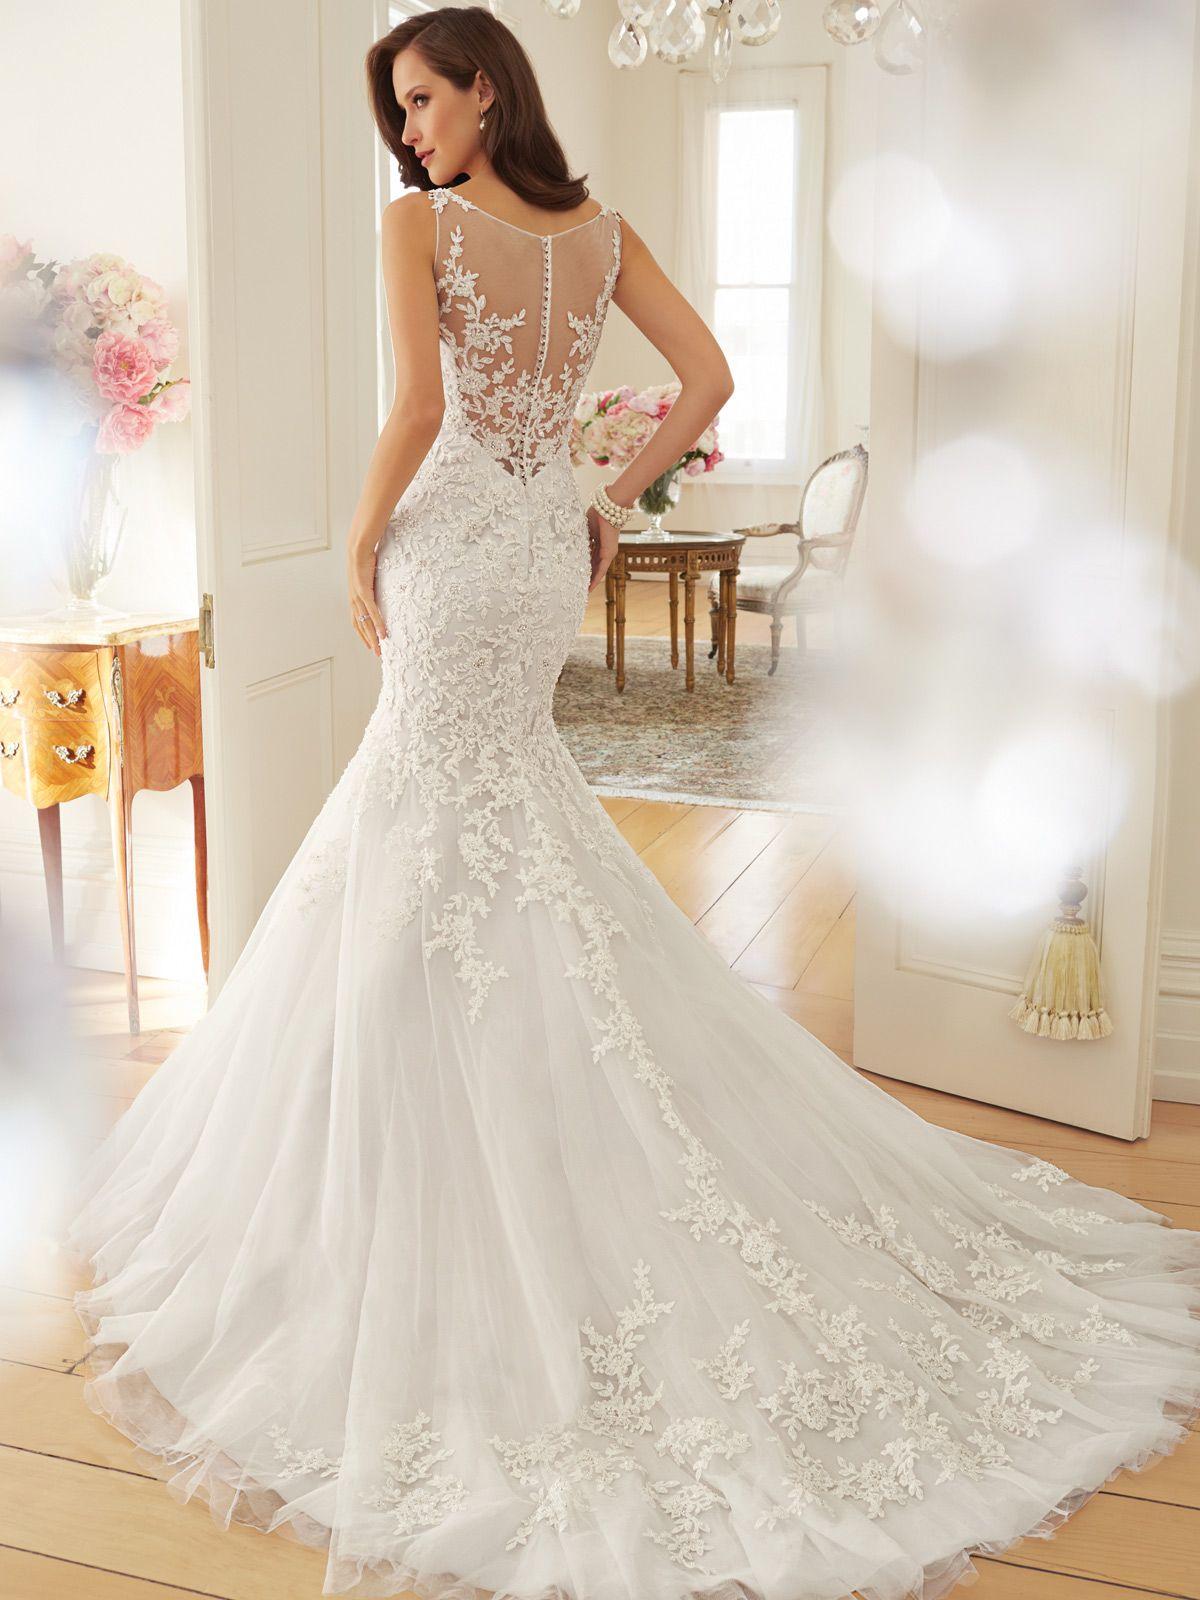 Sophia Tolli Wedding Dresses 2018 for Mon Cheri in 2018 | Mermaid ...